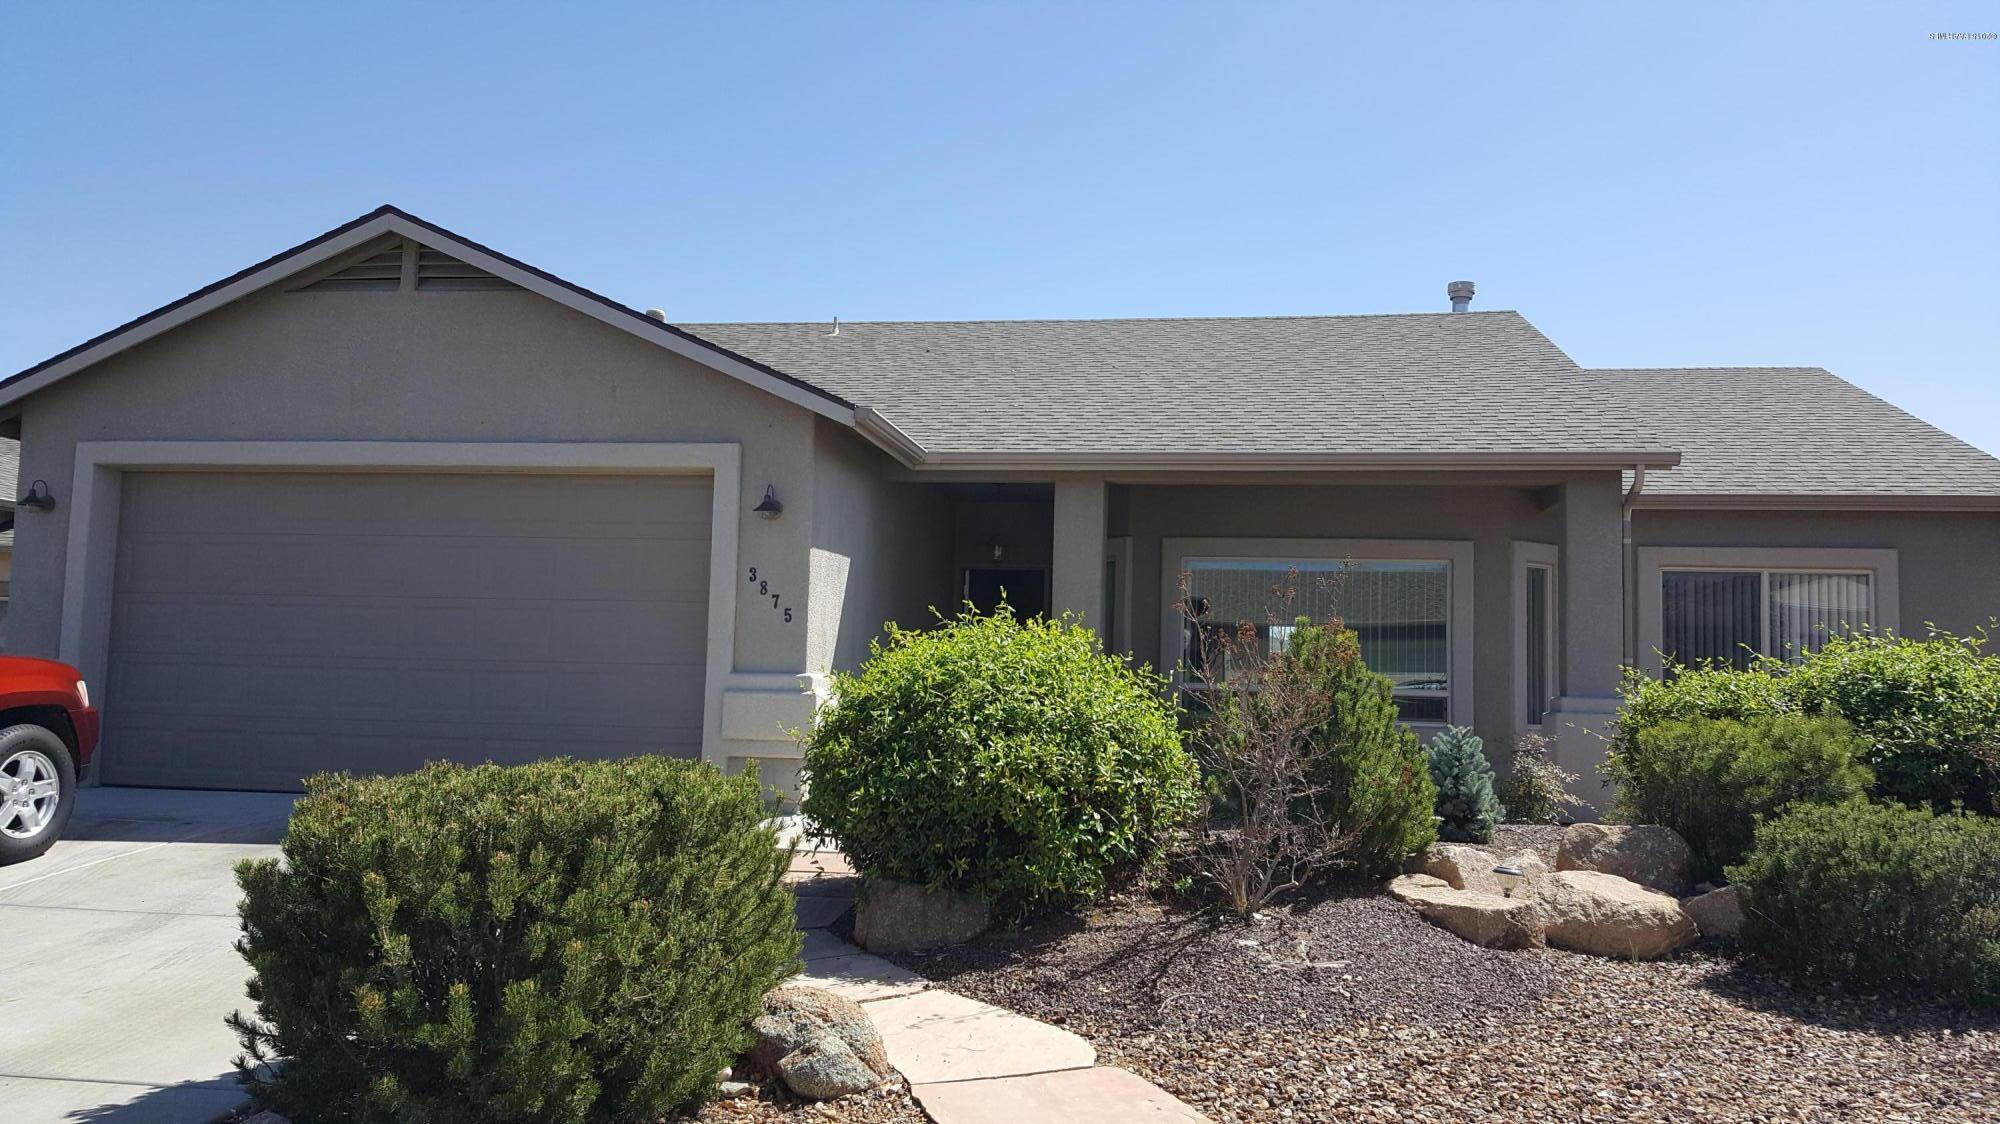 Photo of 3875 Fairfax, Prescott Valley, AZ 86314